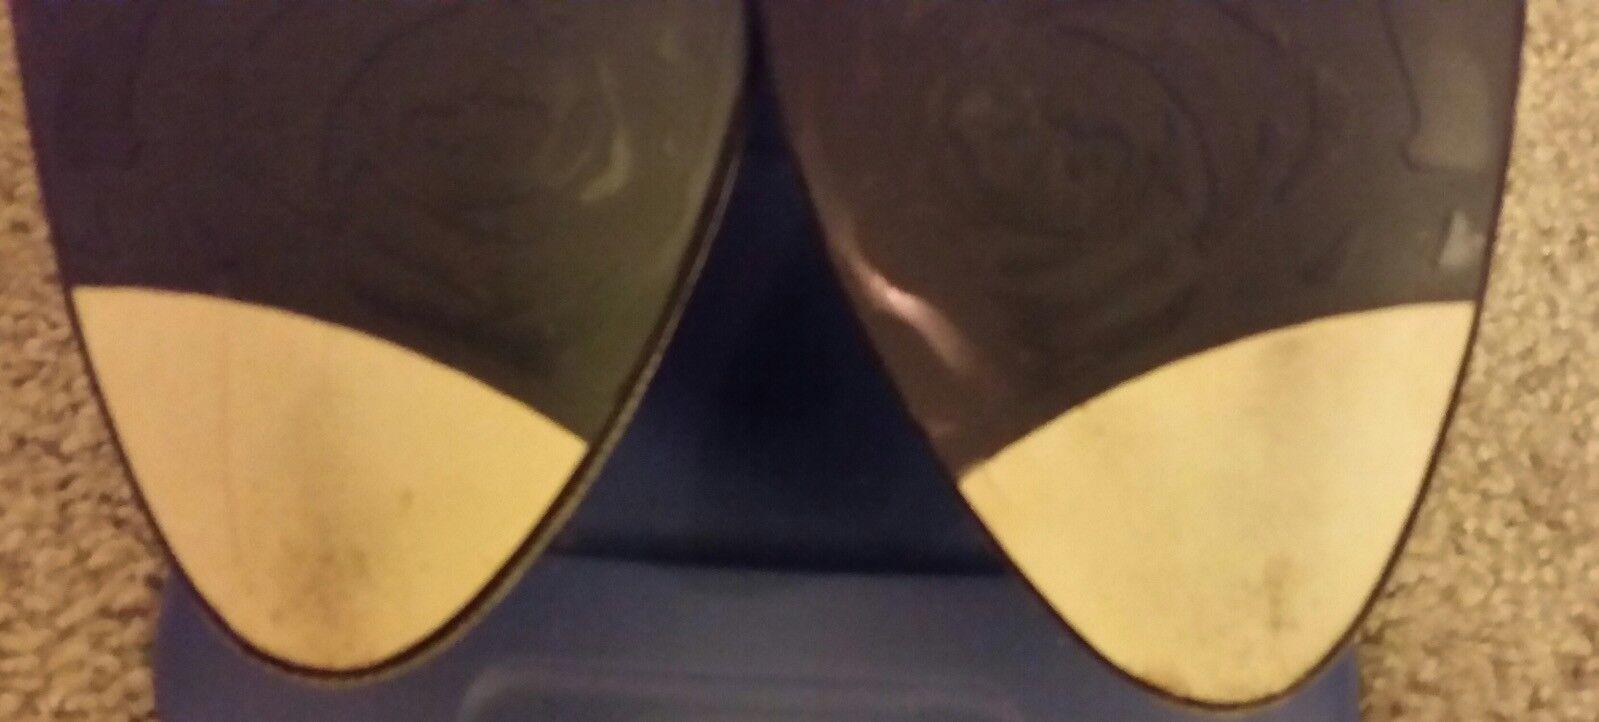 NWOB w/Braun Taryn Rose Beige w/Braun NWOB Patten Leder Ankle Stiefel  SIZE 41.5 (10.5 US) df6e8b